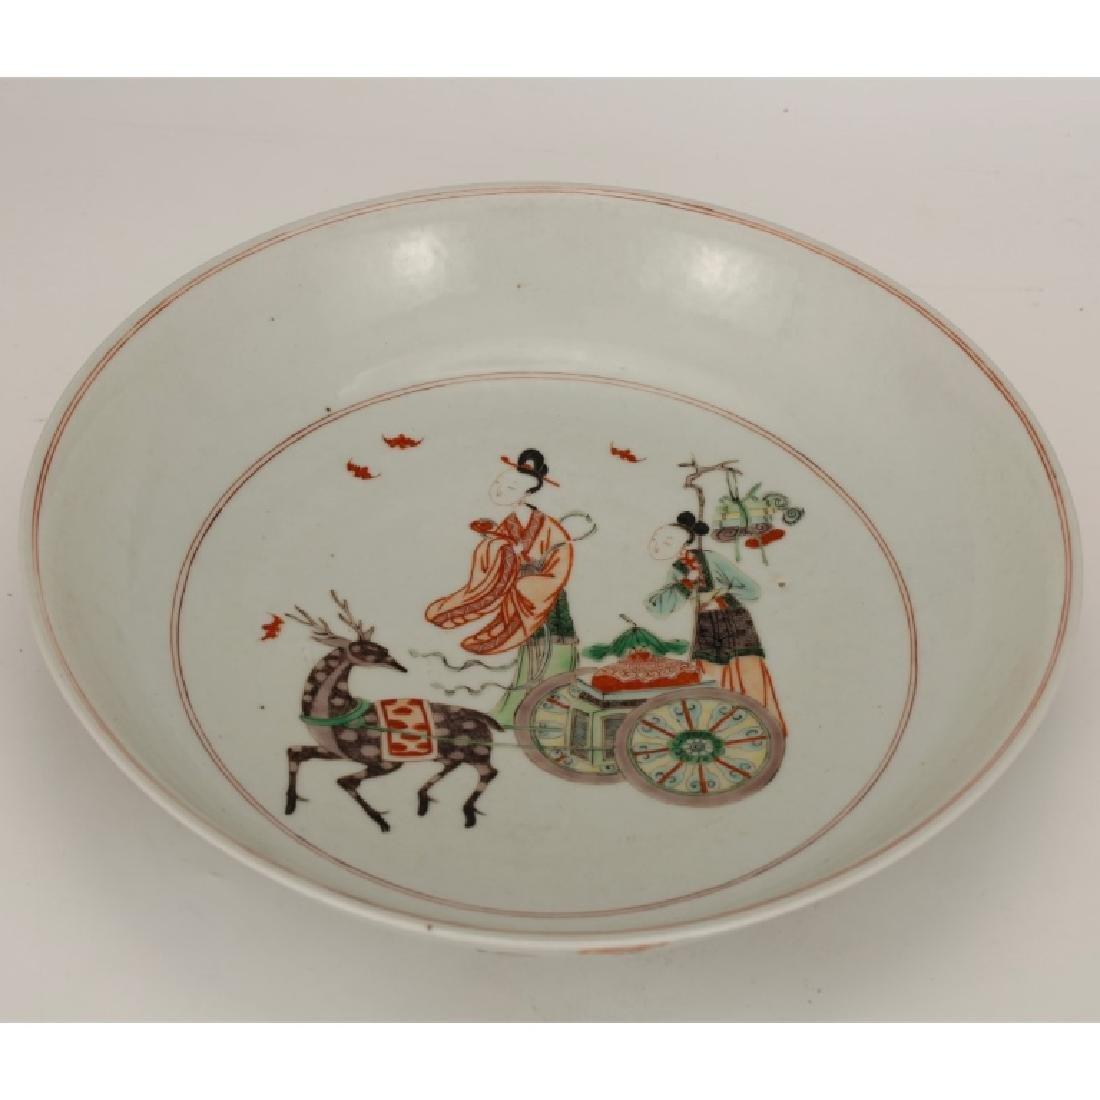 Chinese Qing Porcelain Famille Verte Plate - 2